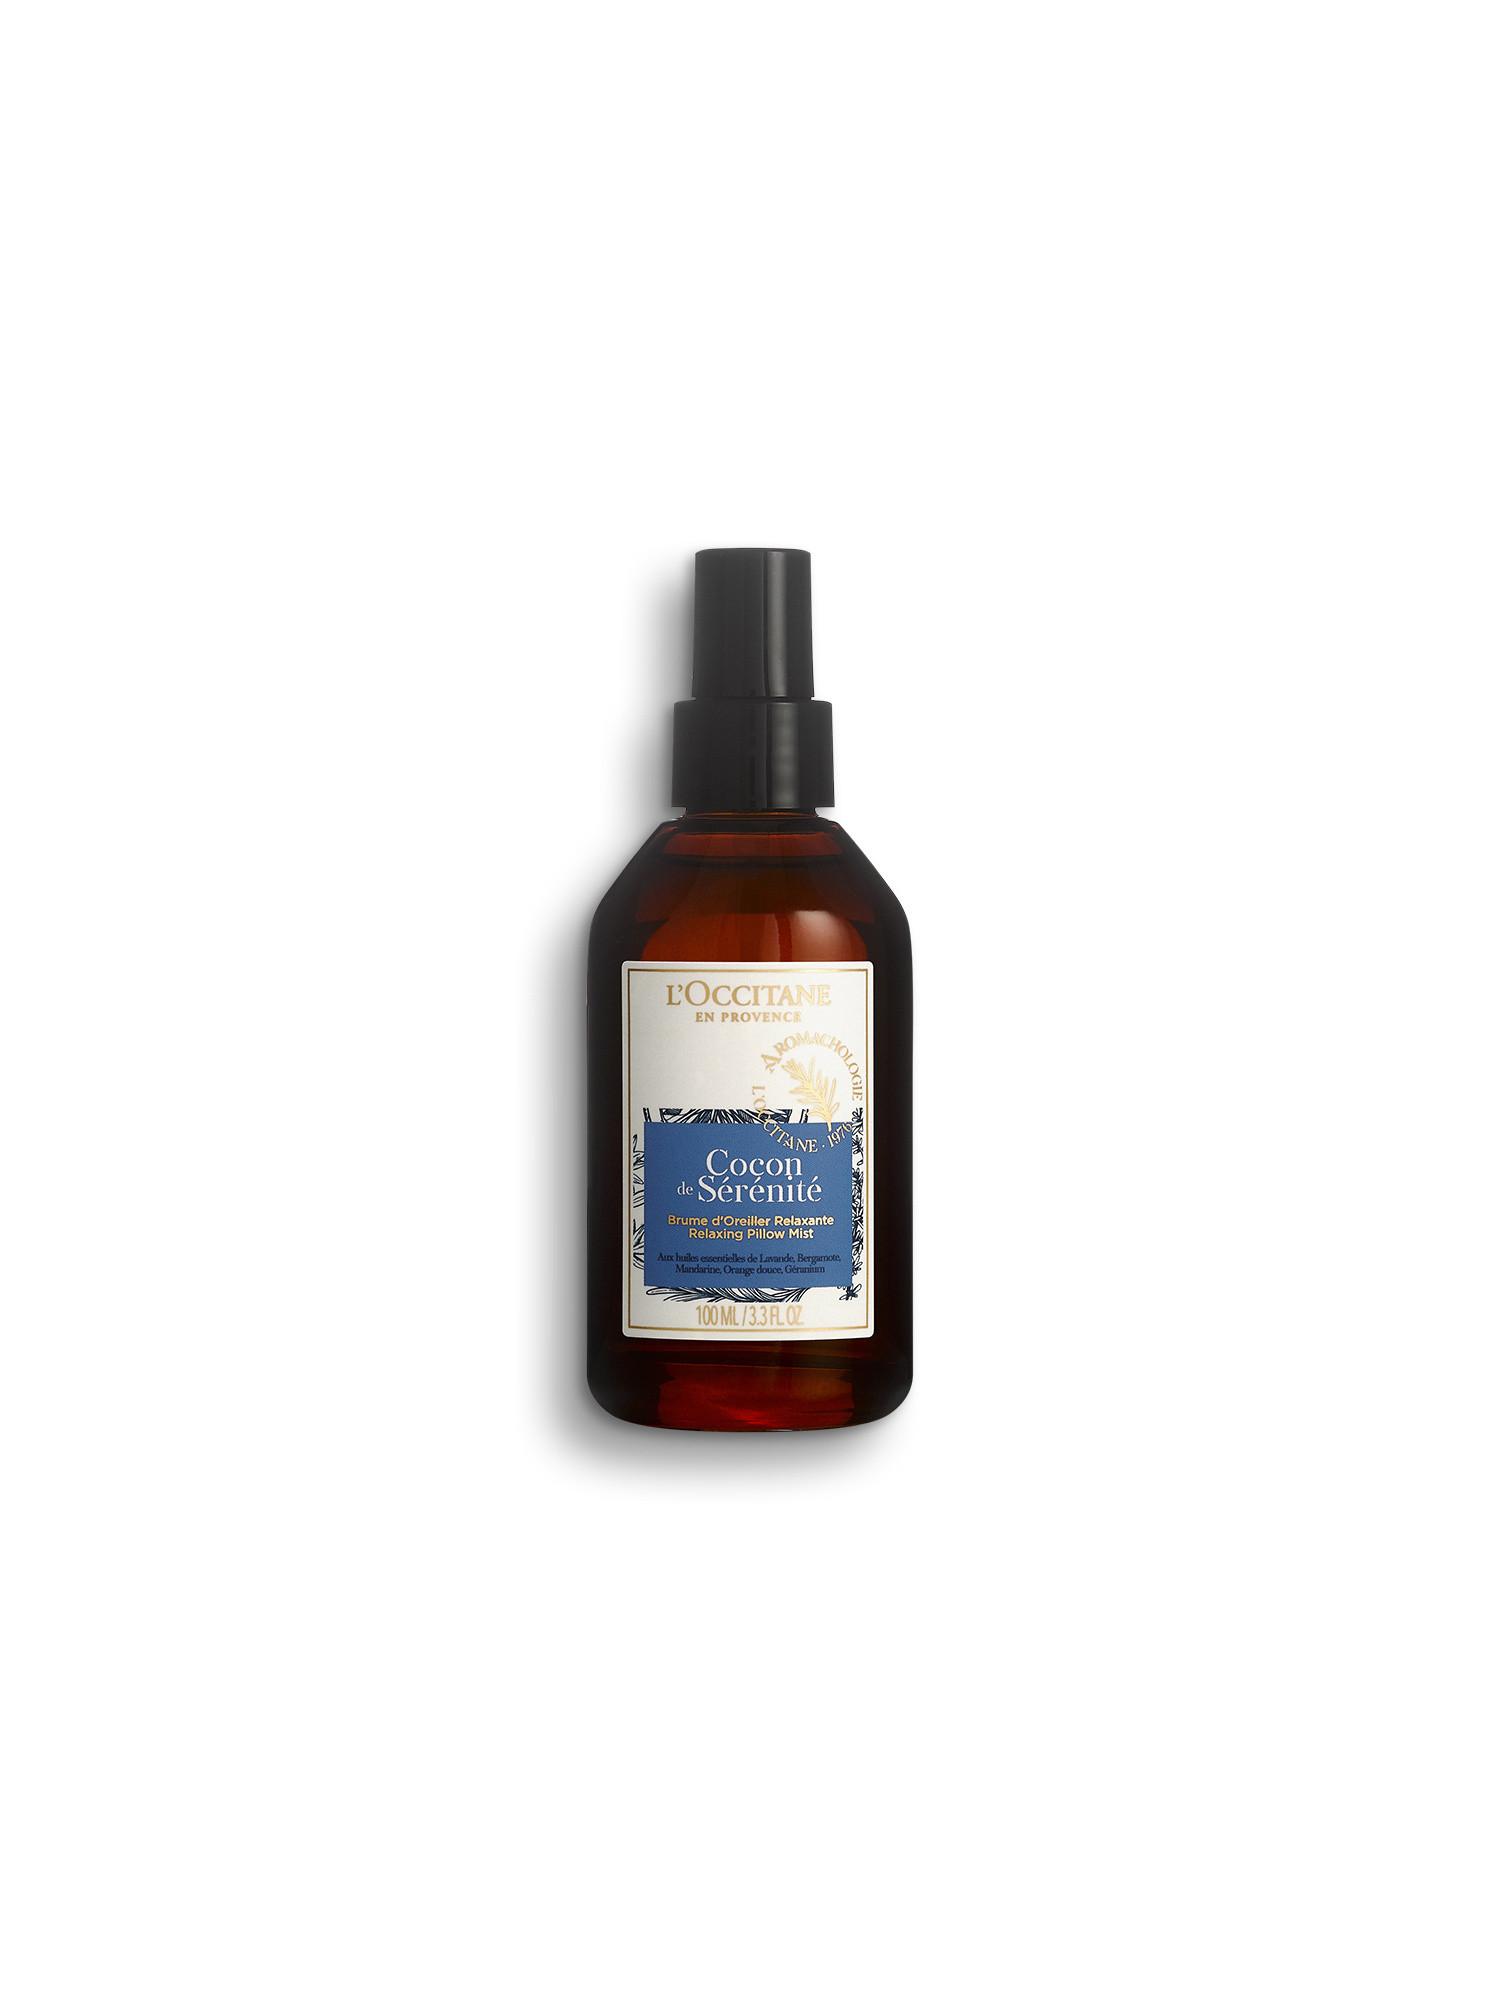 Spray Per Cuscino Rilassante 100 ml, Trasparente, large image number 0